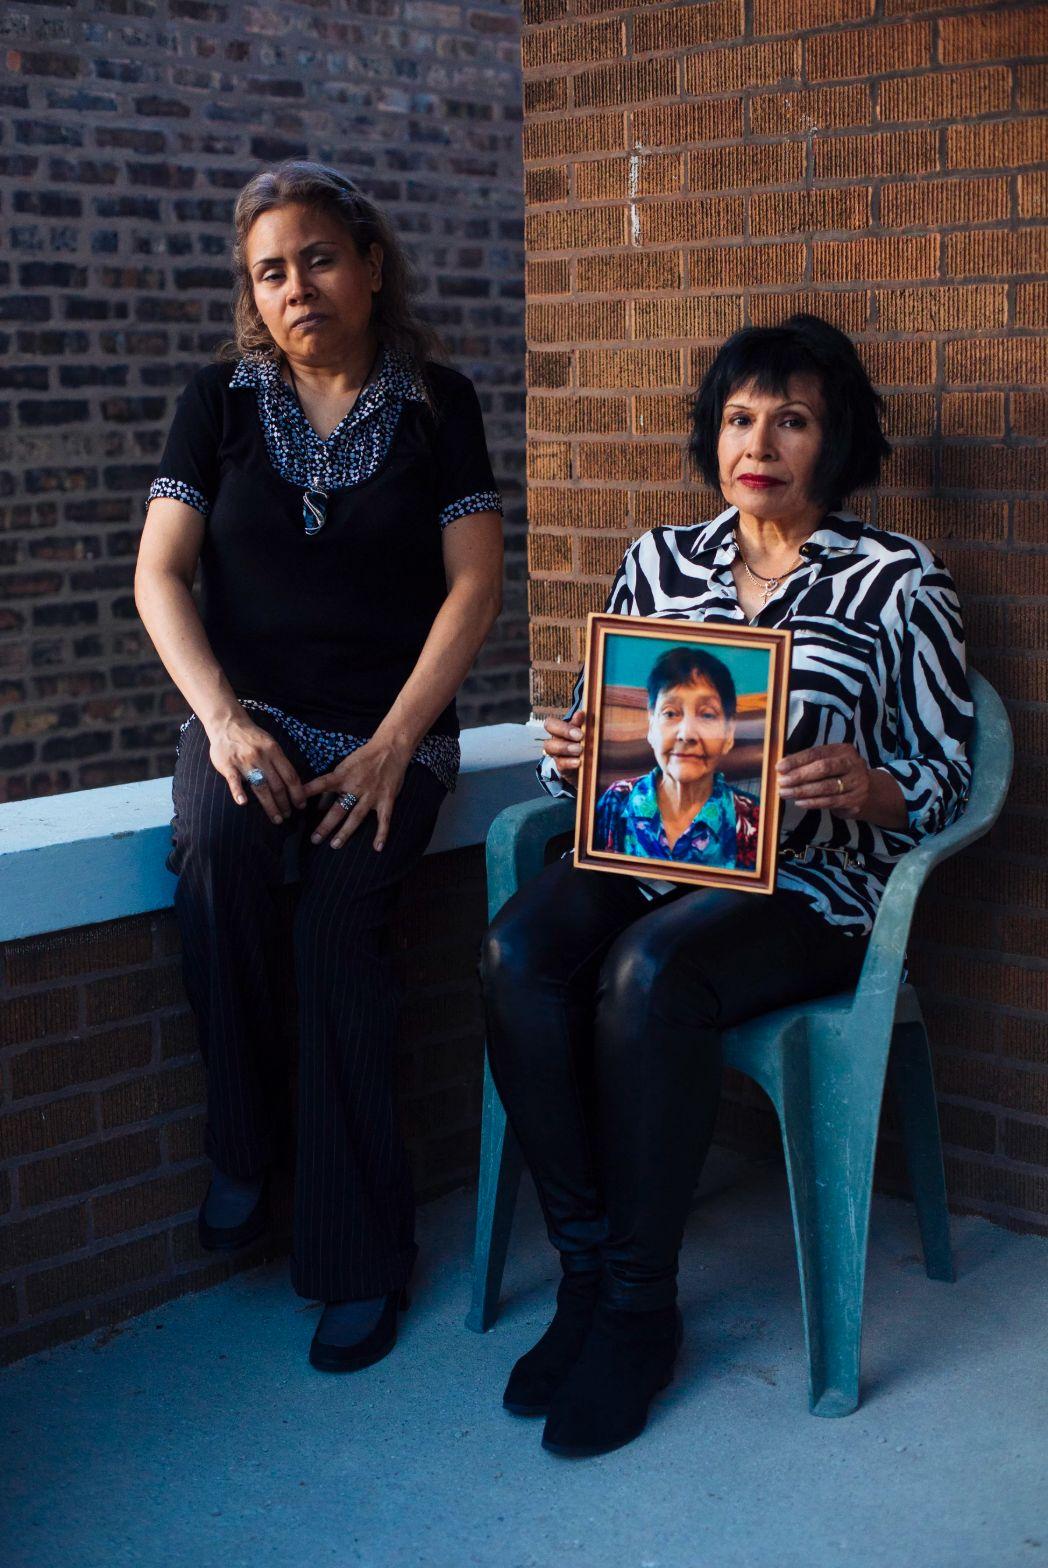 Eleanore Escamilla, left, with her sister Irma Escamilla, holding a photo of their mother, Telesfora Escamilla, who was in a